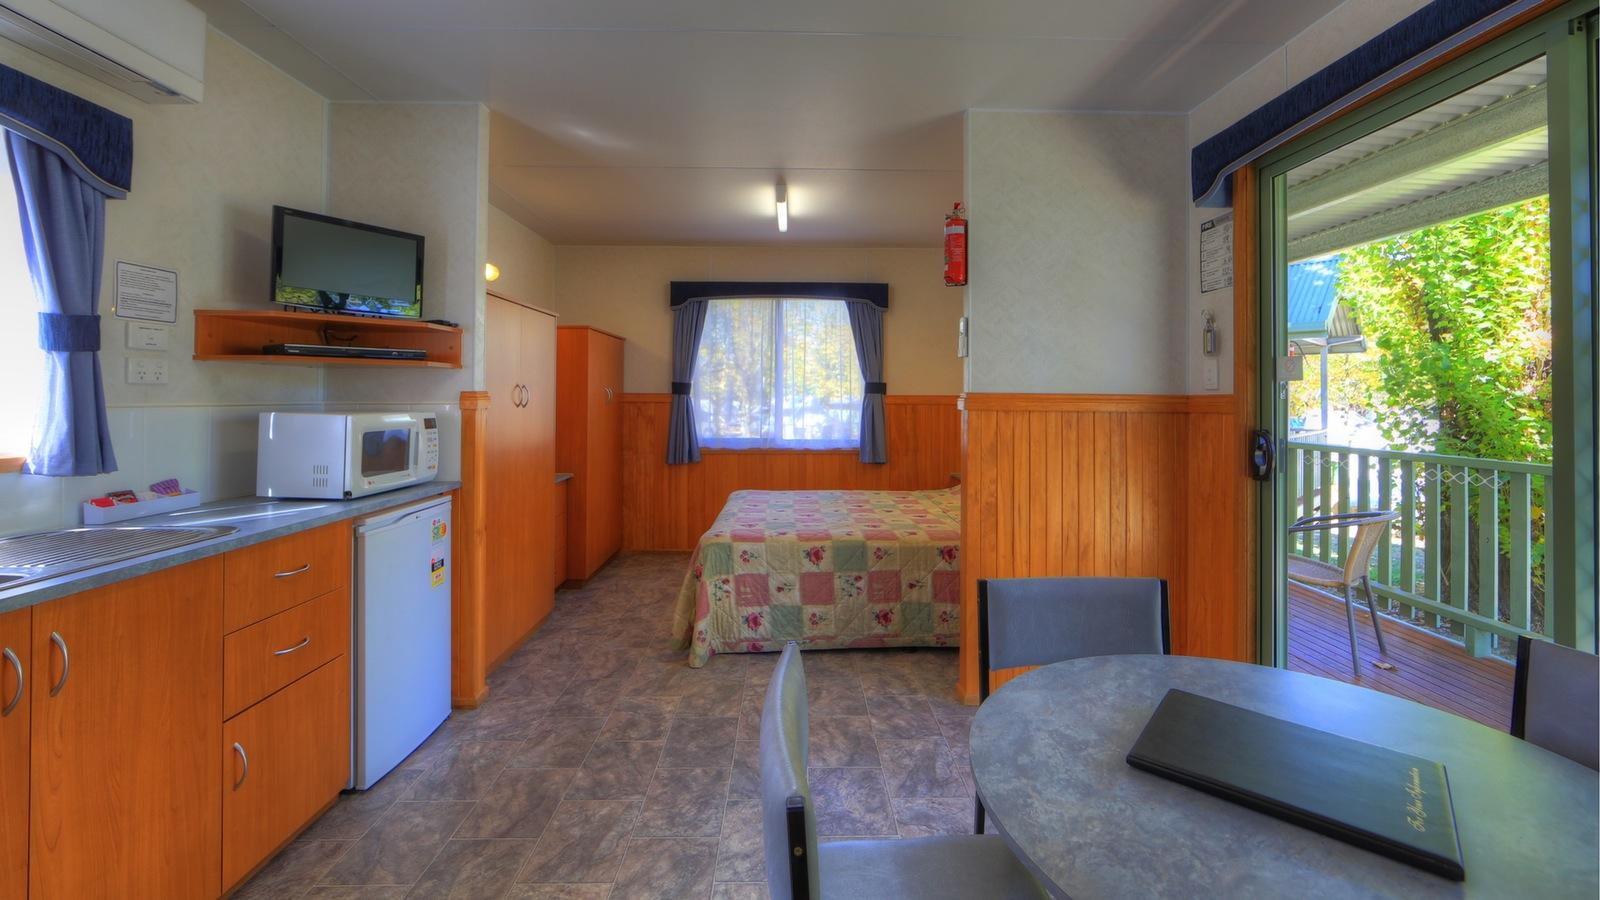 Standard Studio cabin - internal view